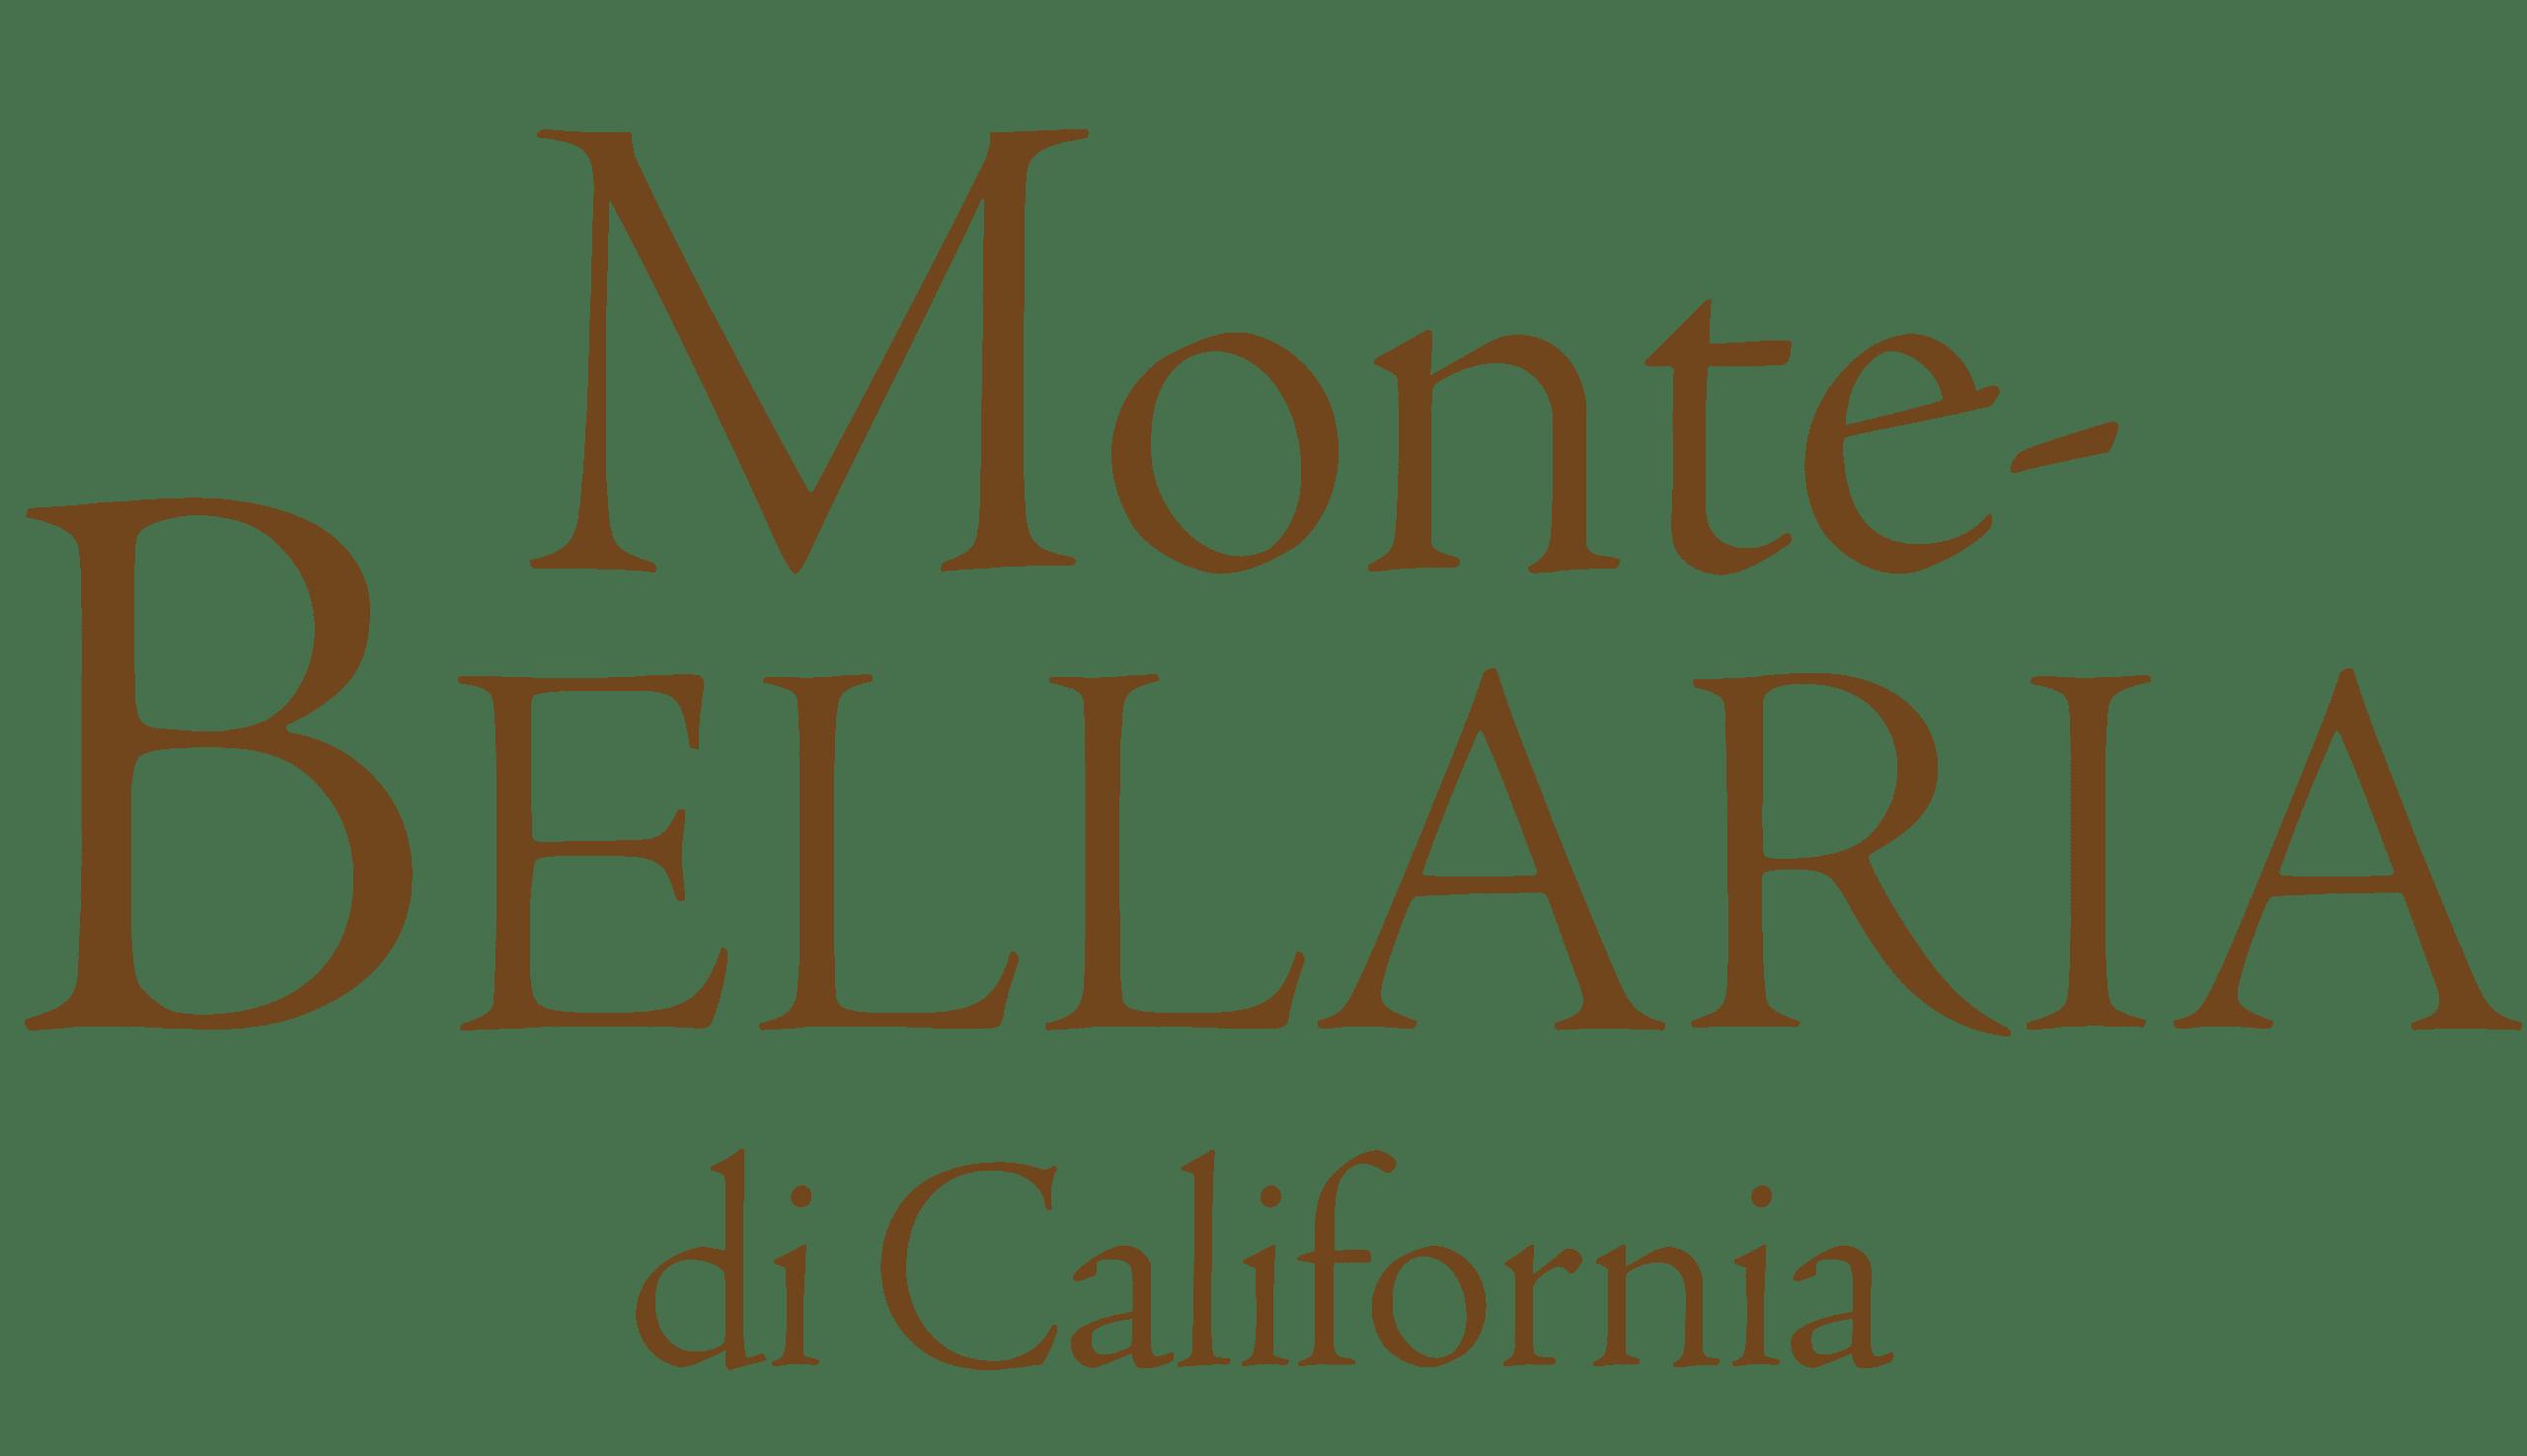 Monte-Bellaria di California logo